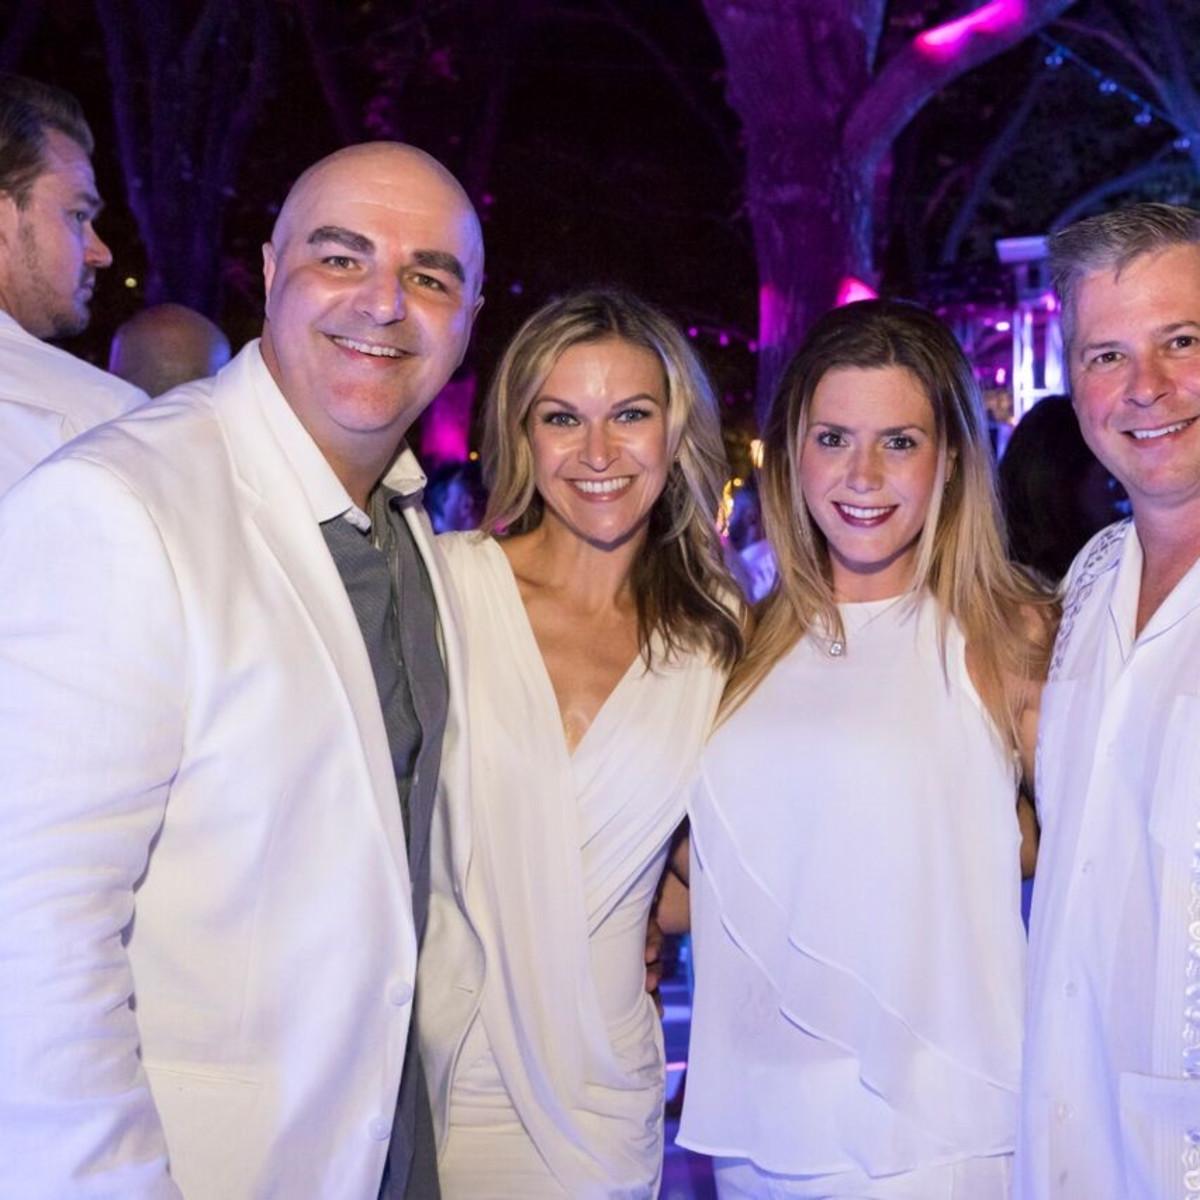 Tommy DeAlano, Krystal DeAlano, Jennifer Guidry, Mike Guidry, White Party 2018